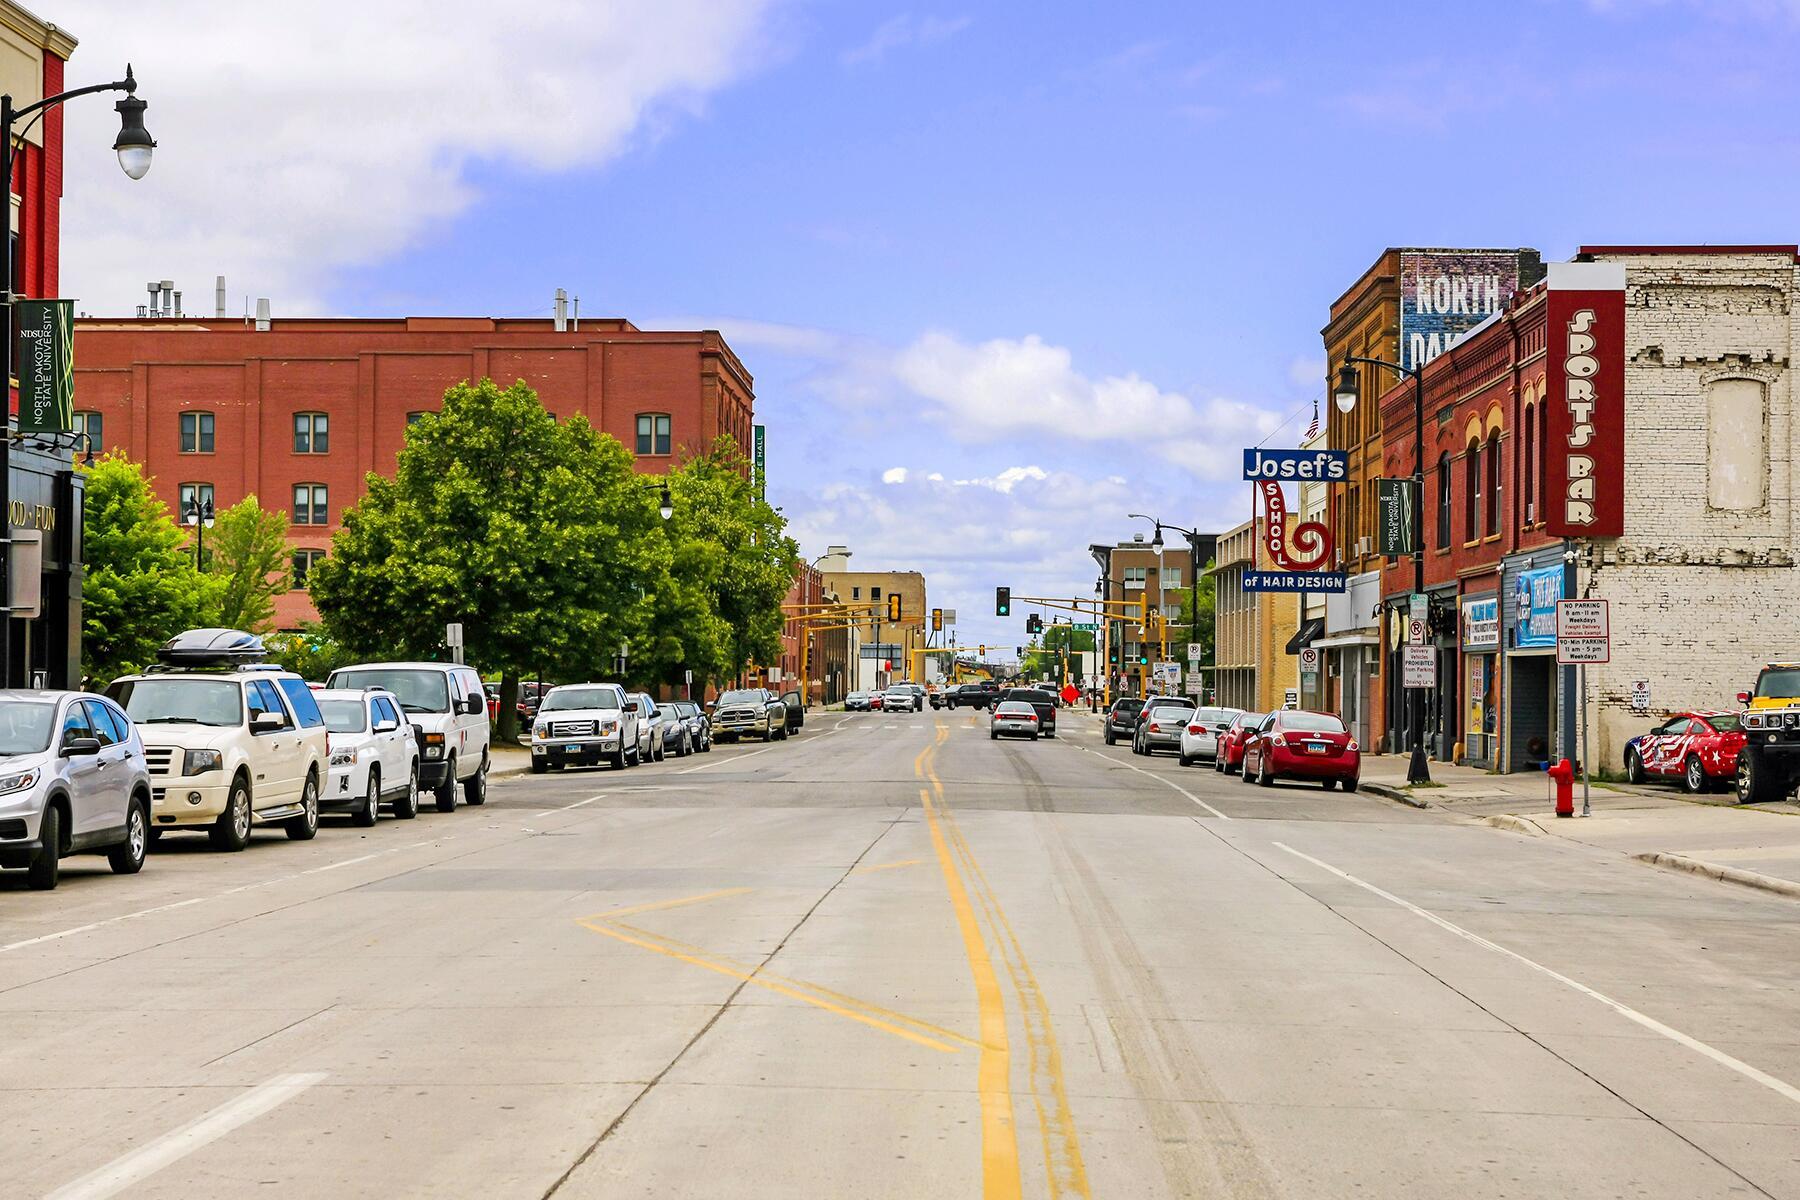 Bismarck to Fargo, North Dakota